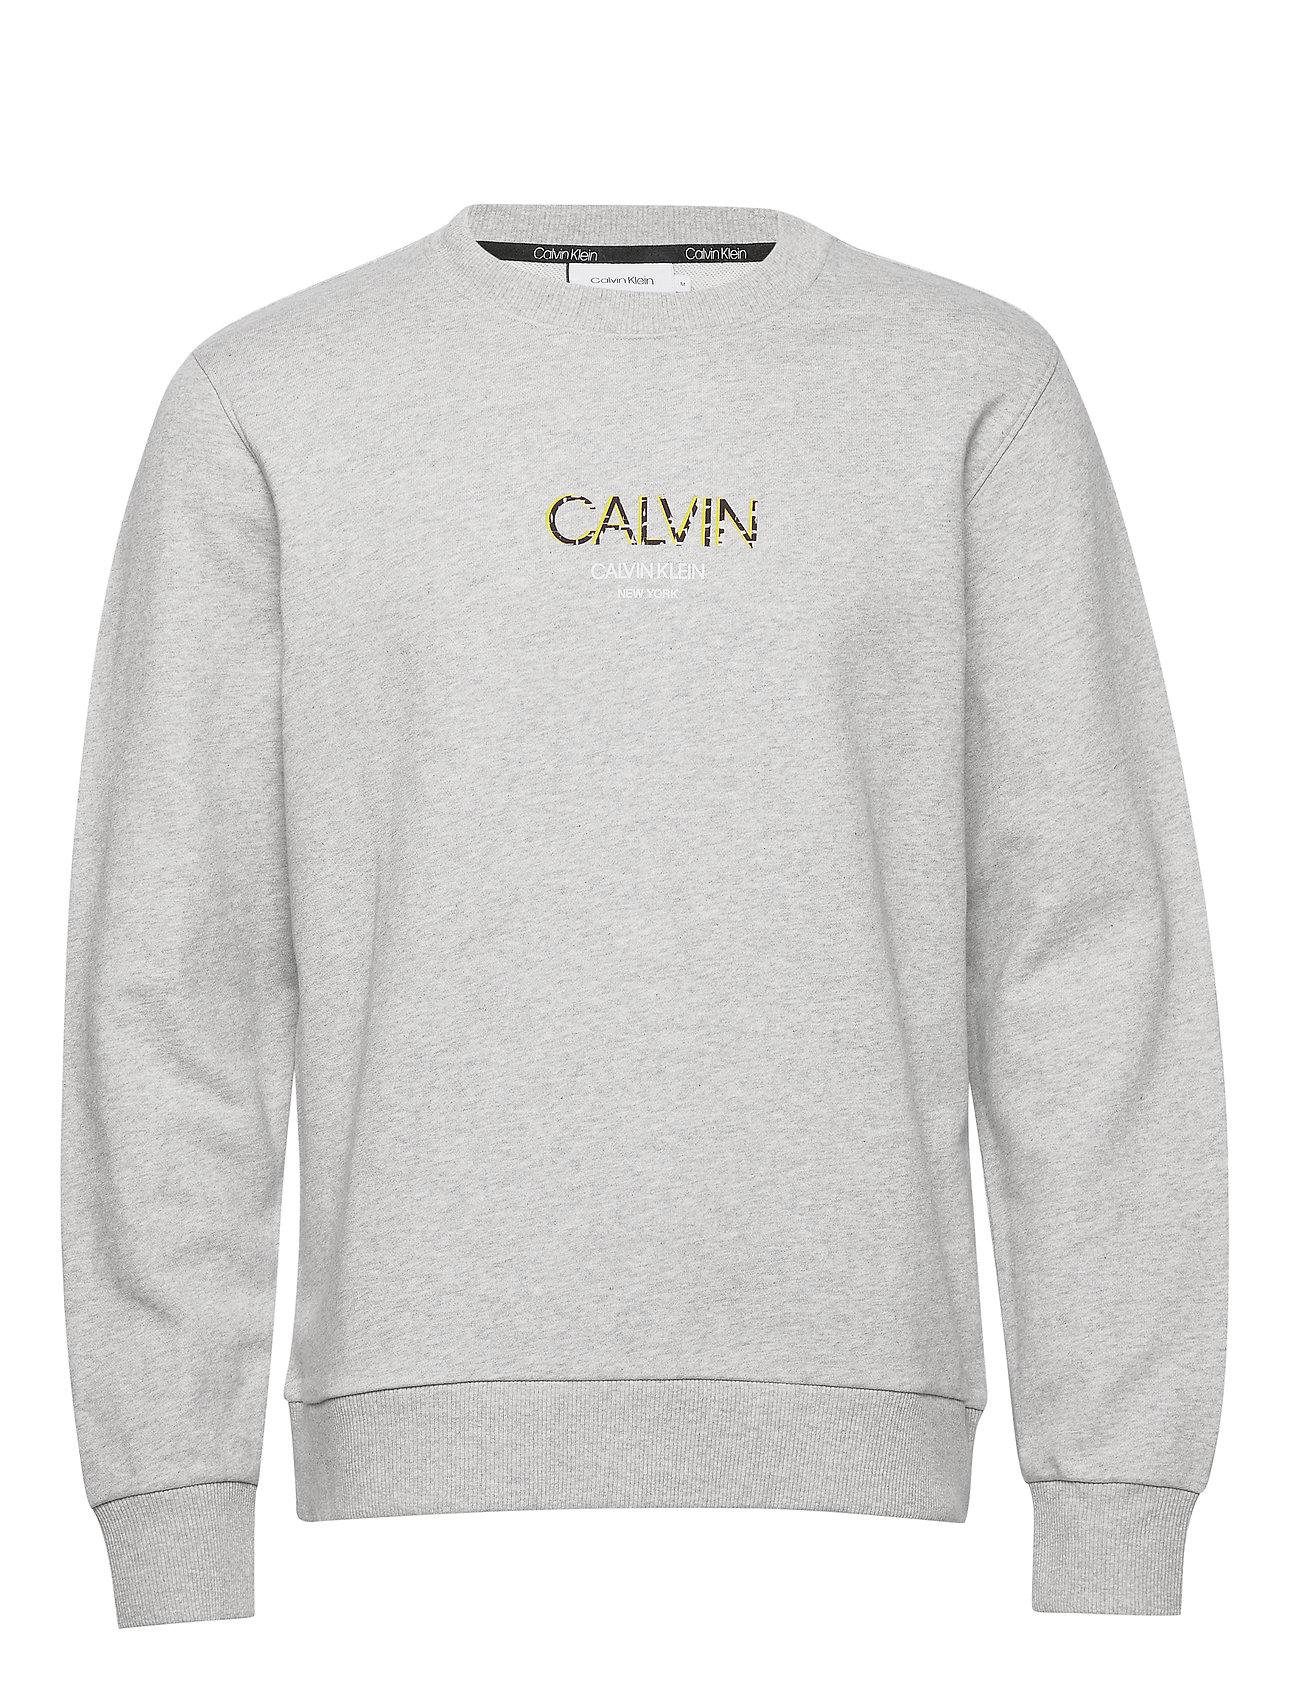 Image of Calvin Small Logo Sweatshirt Sweatshirt Trøje Grå Calvin Klein (3411339049)